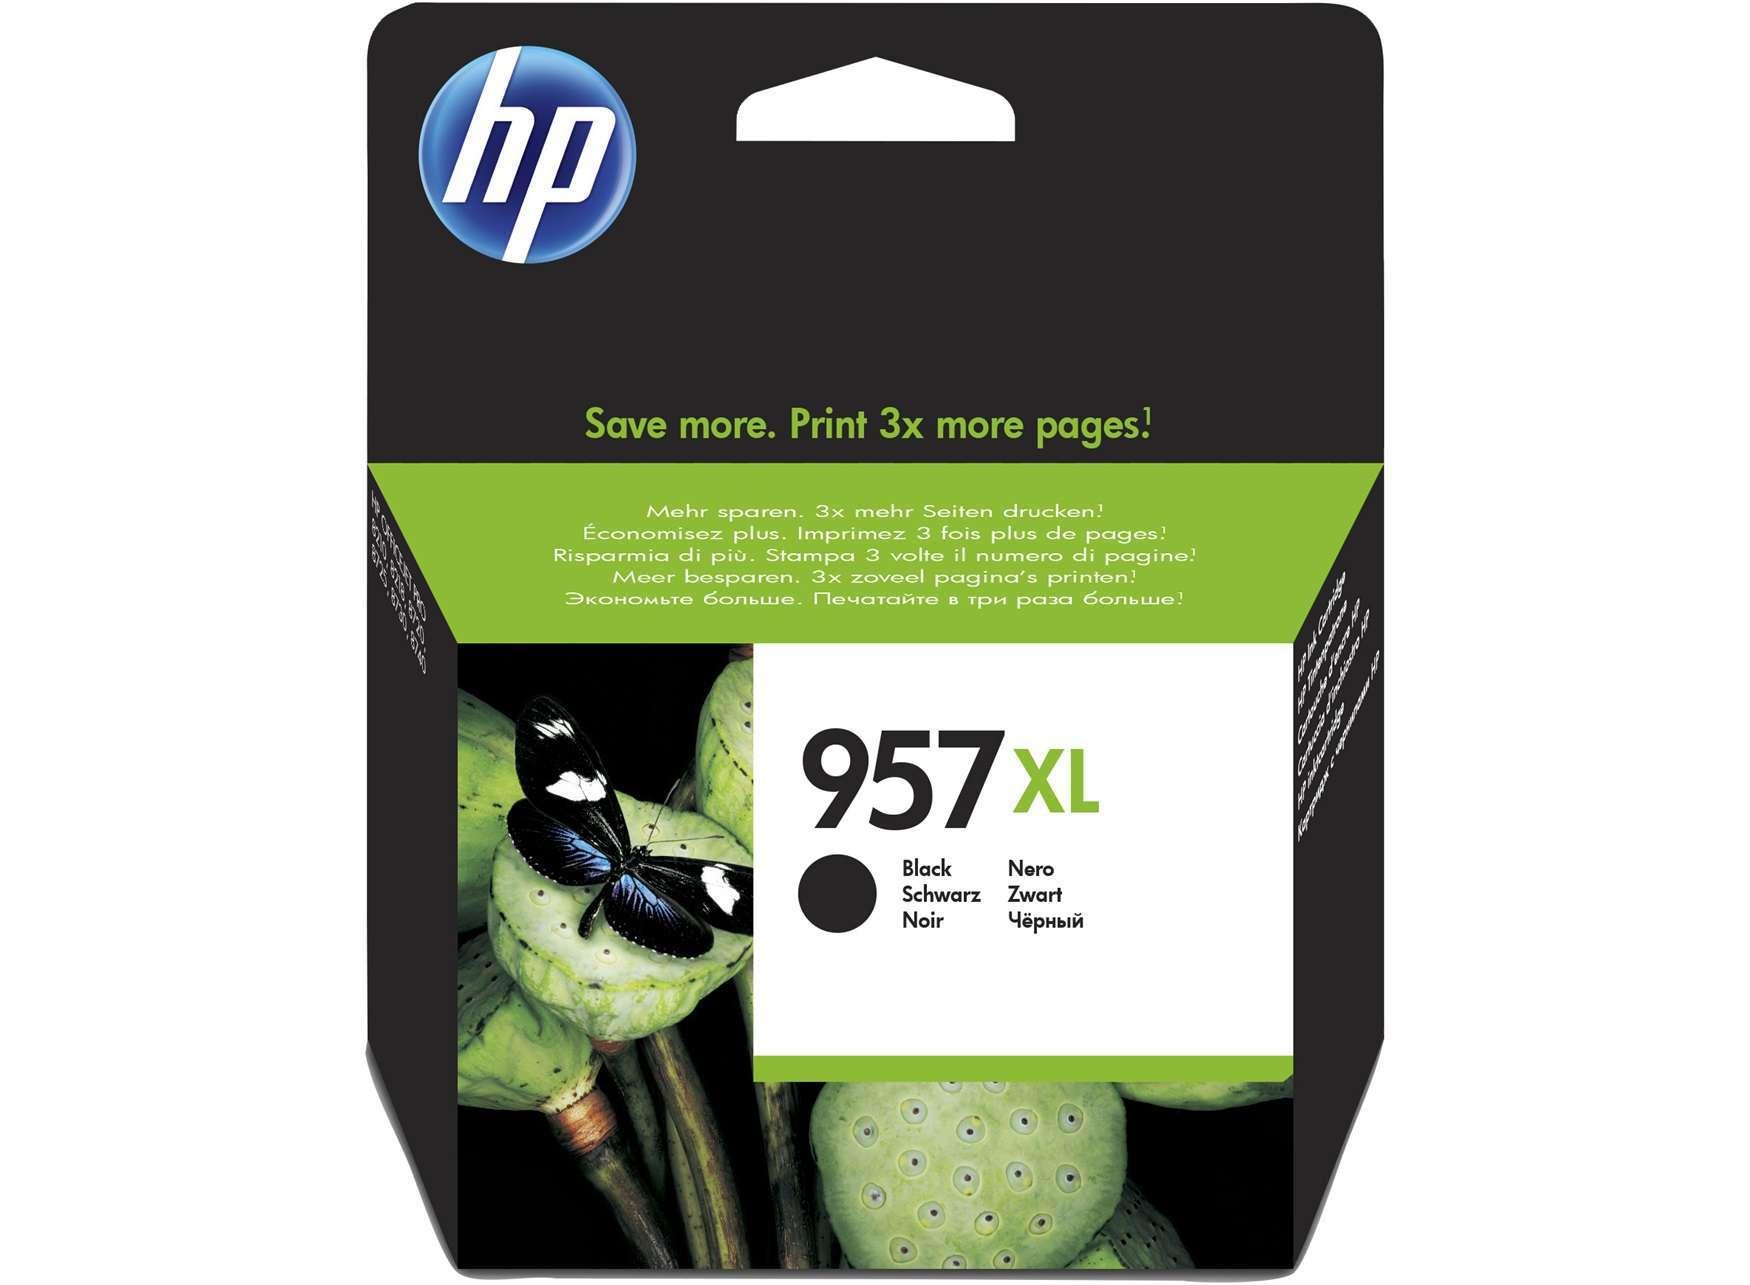 HP Original 957XL Black High Capacity Inkjet Cartridge (L0R40AE)